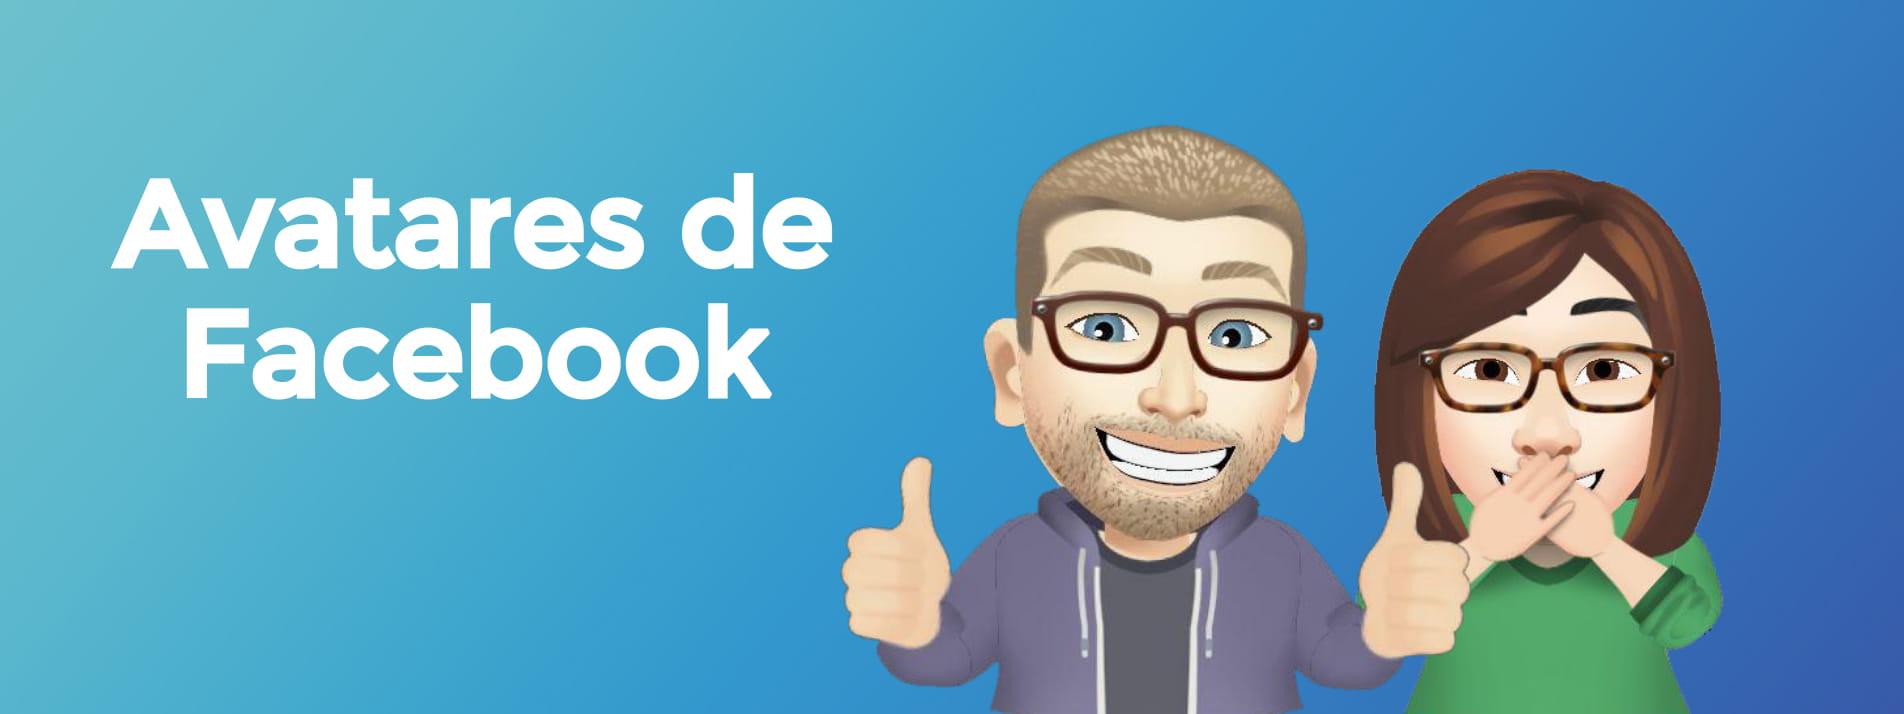 avatares de facebook